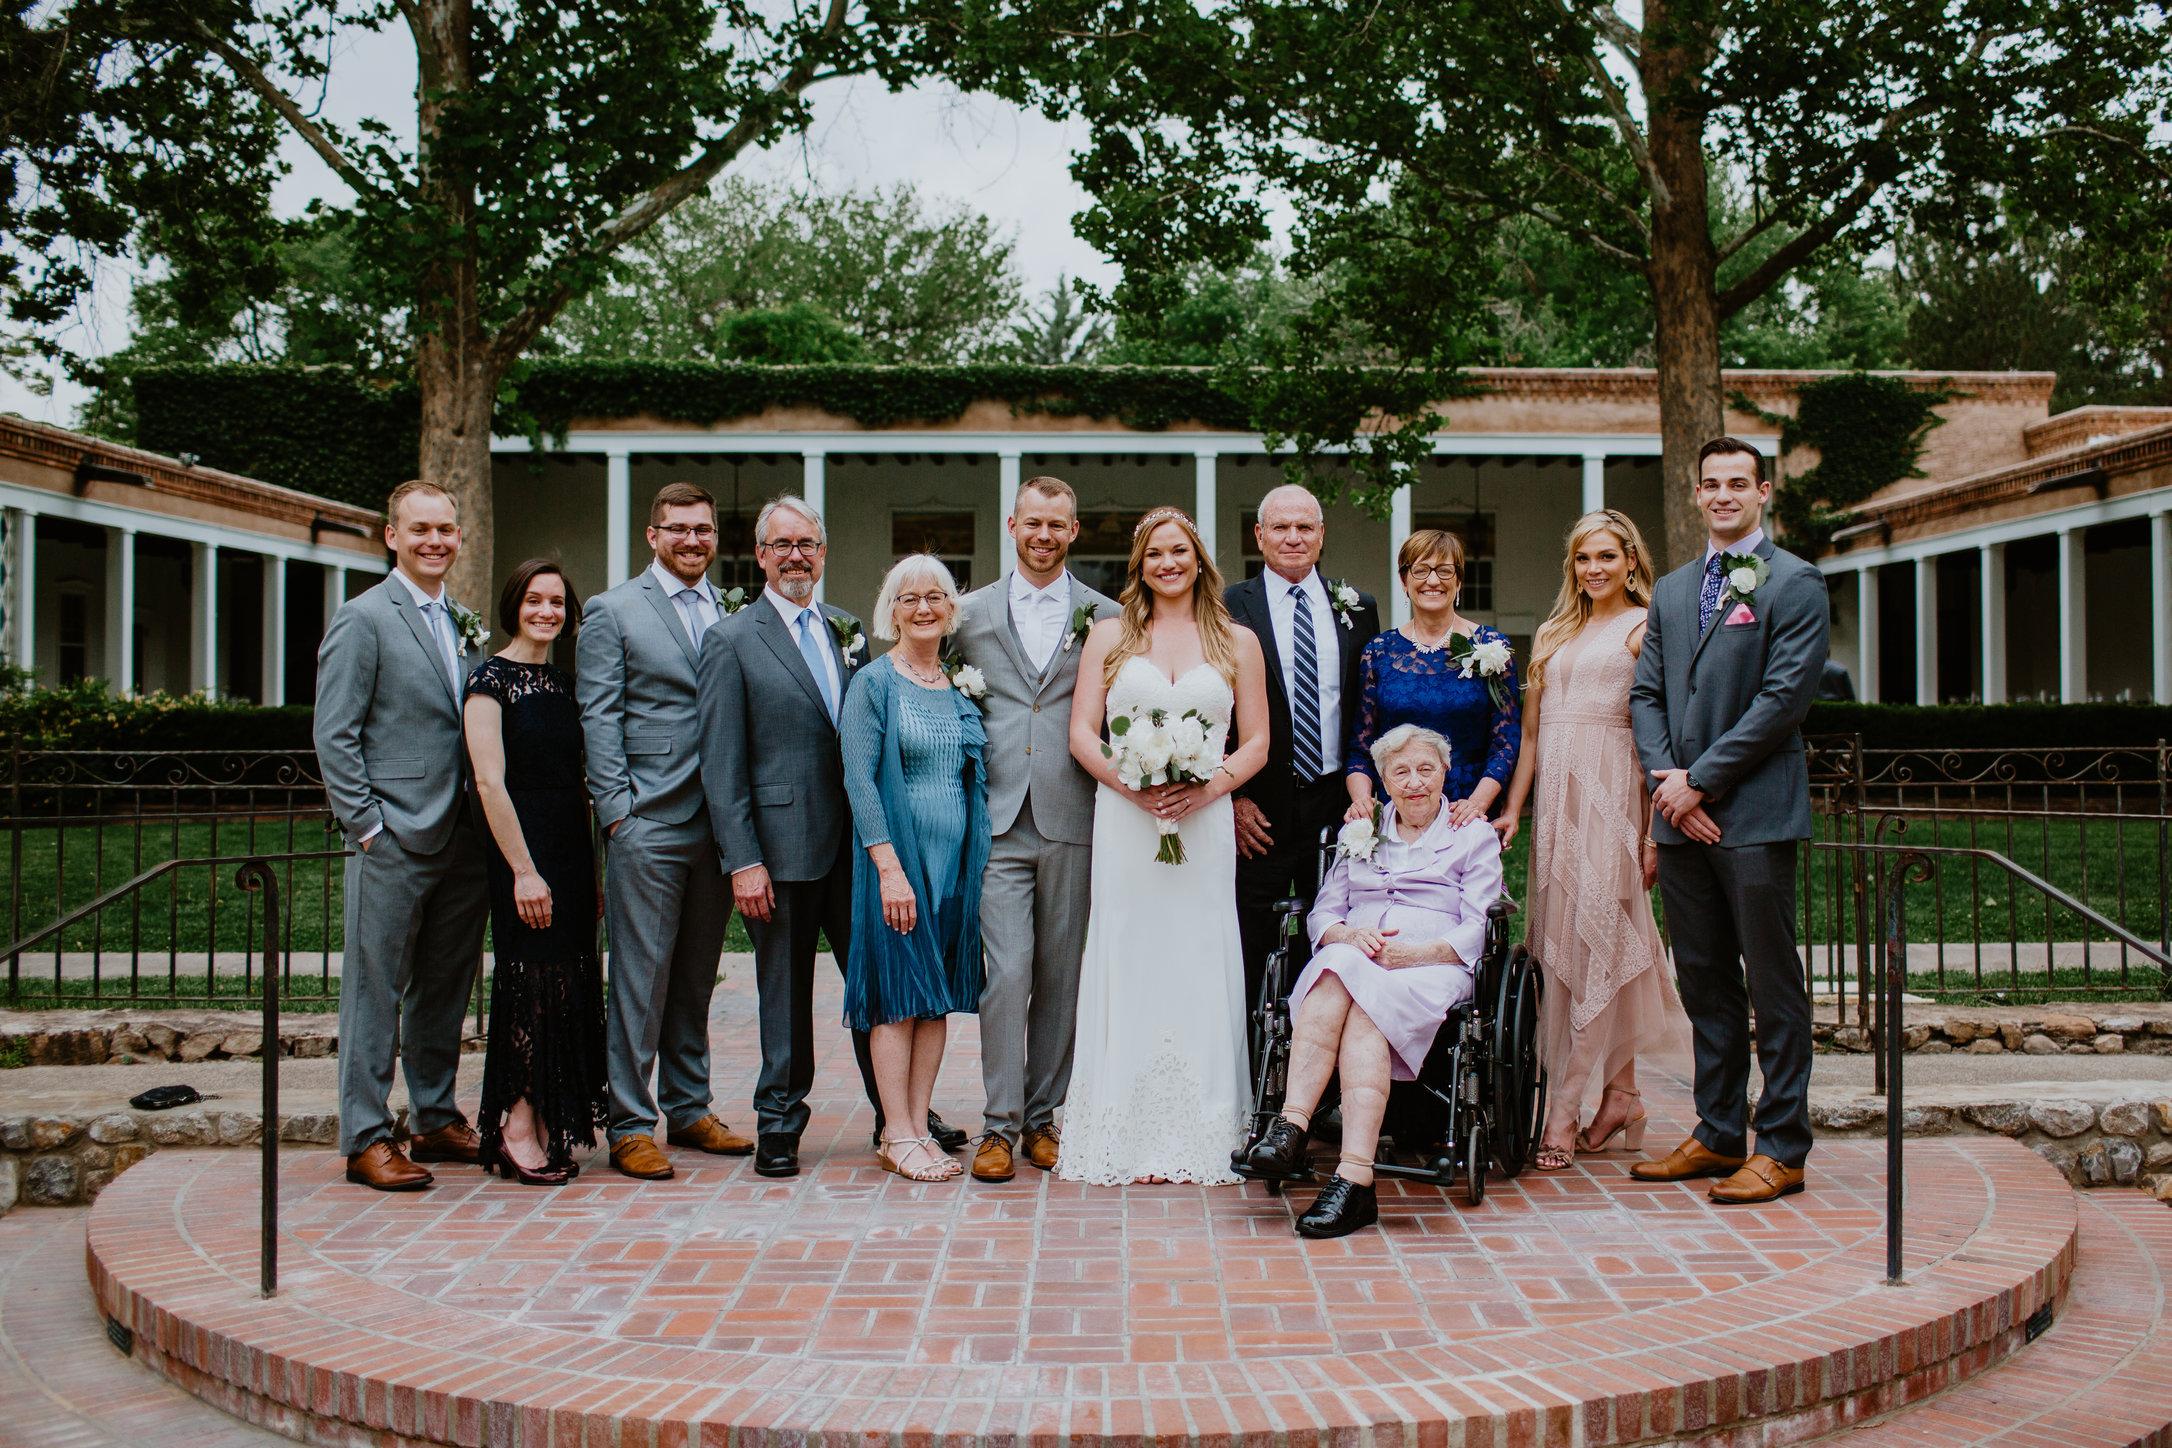 DandA-wedding-471.jpg